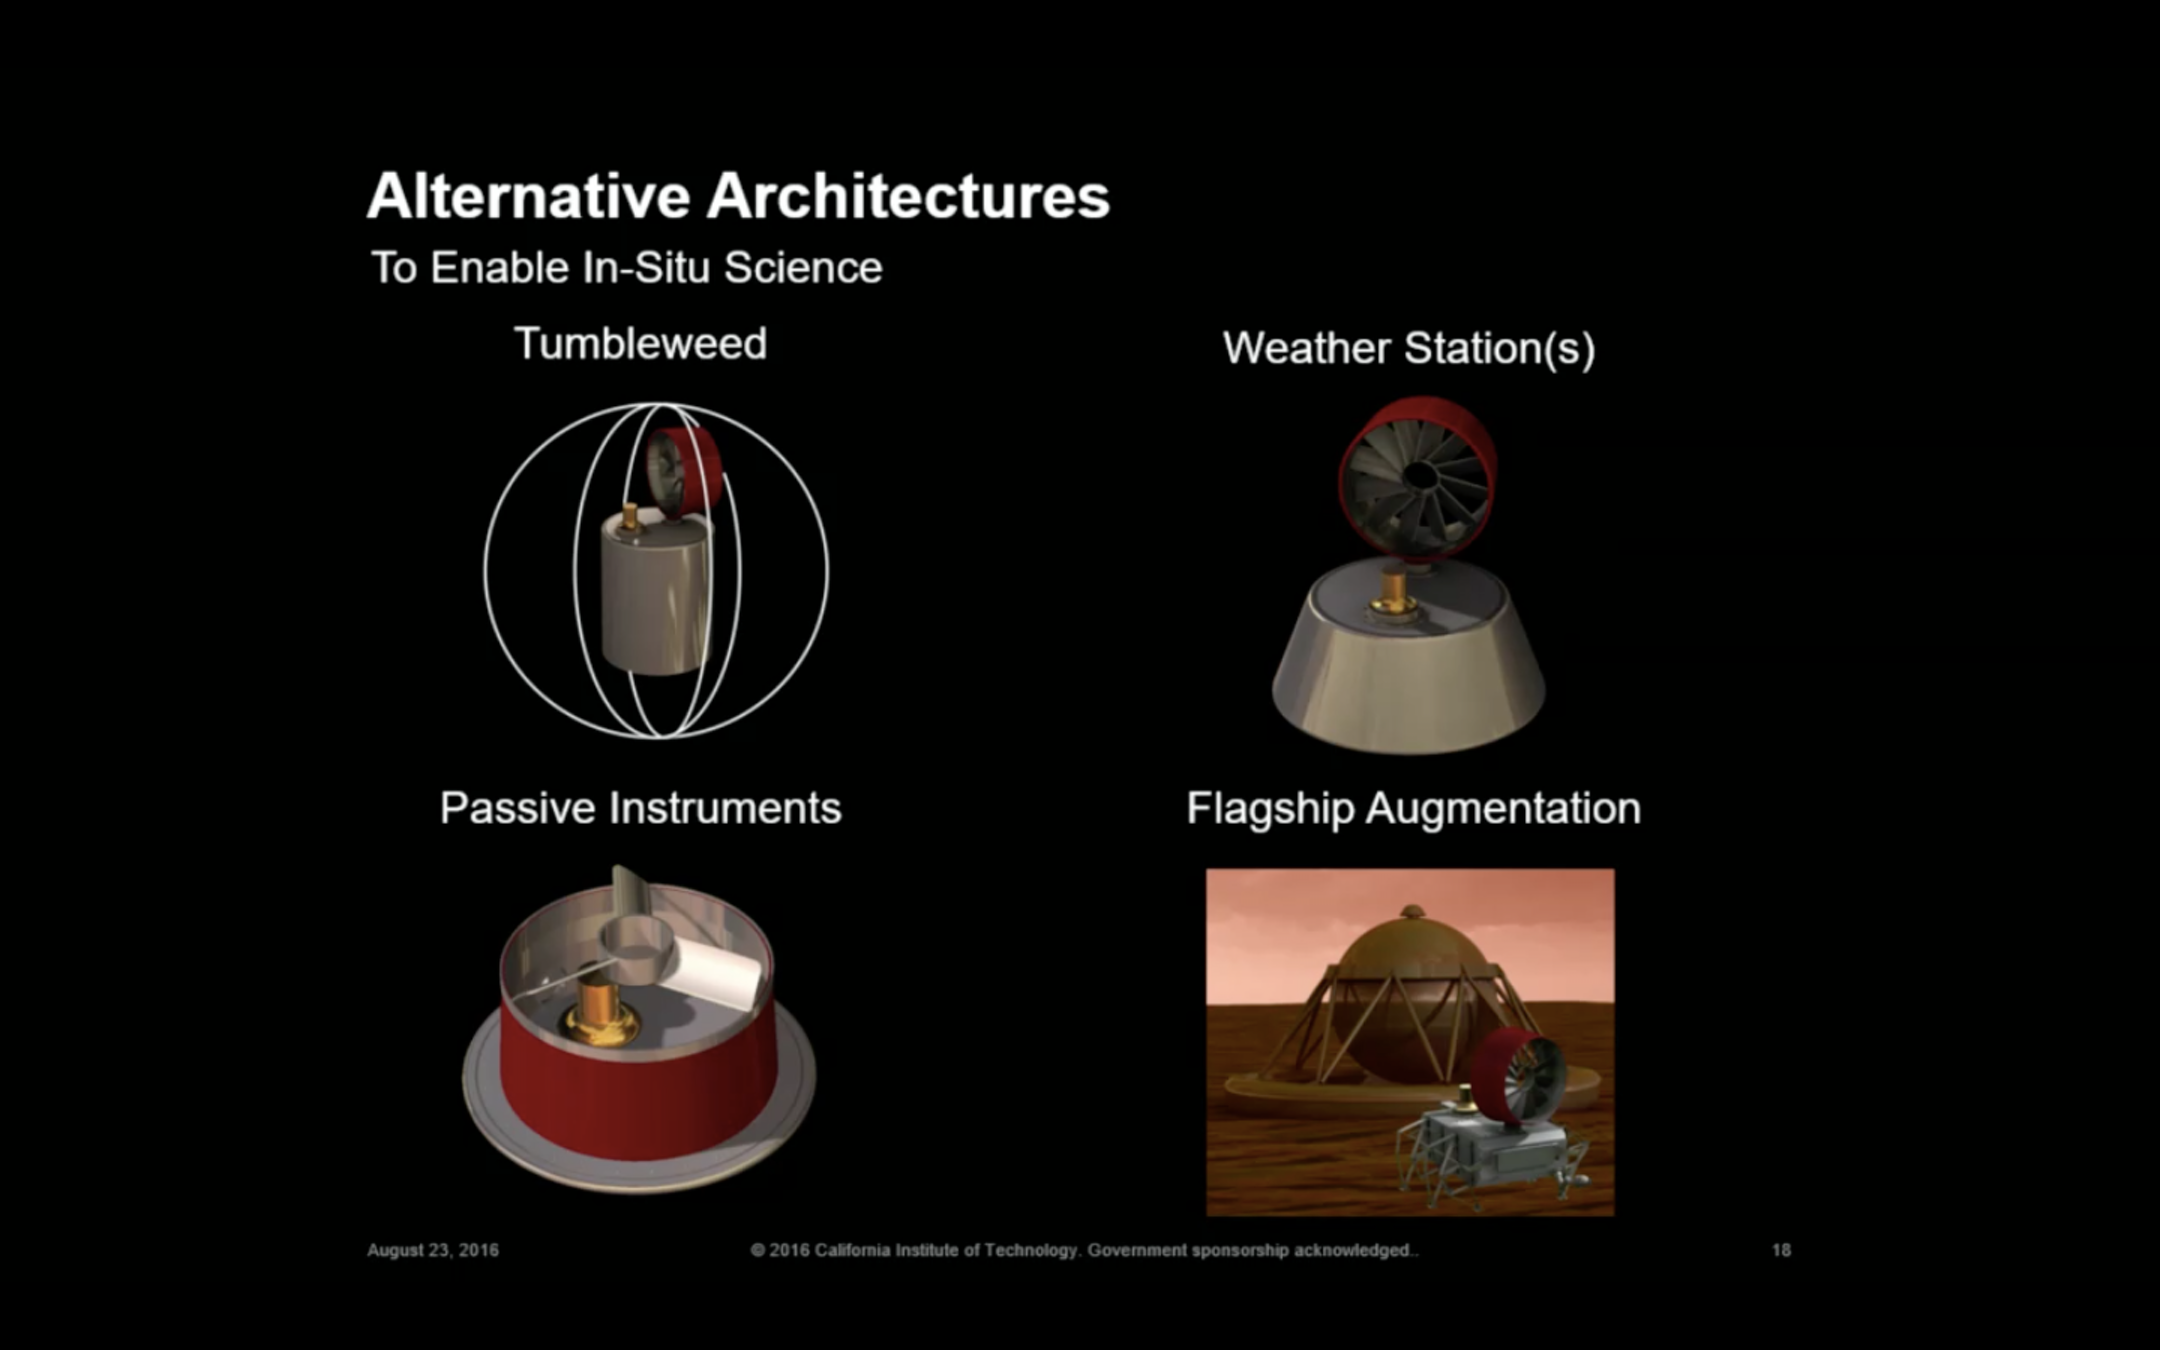 Sauder's ideas for alternative architectures